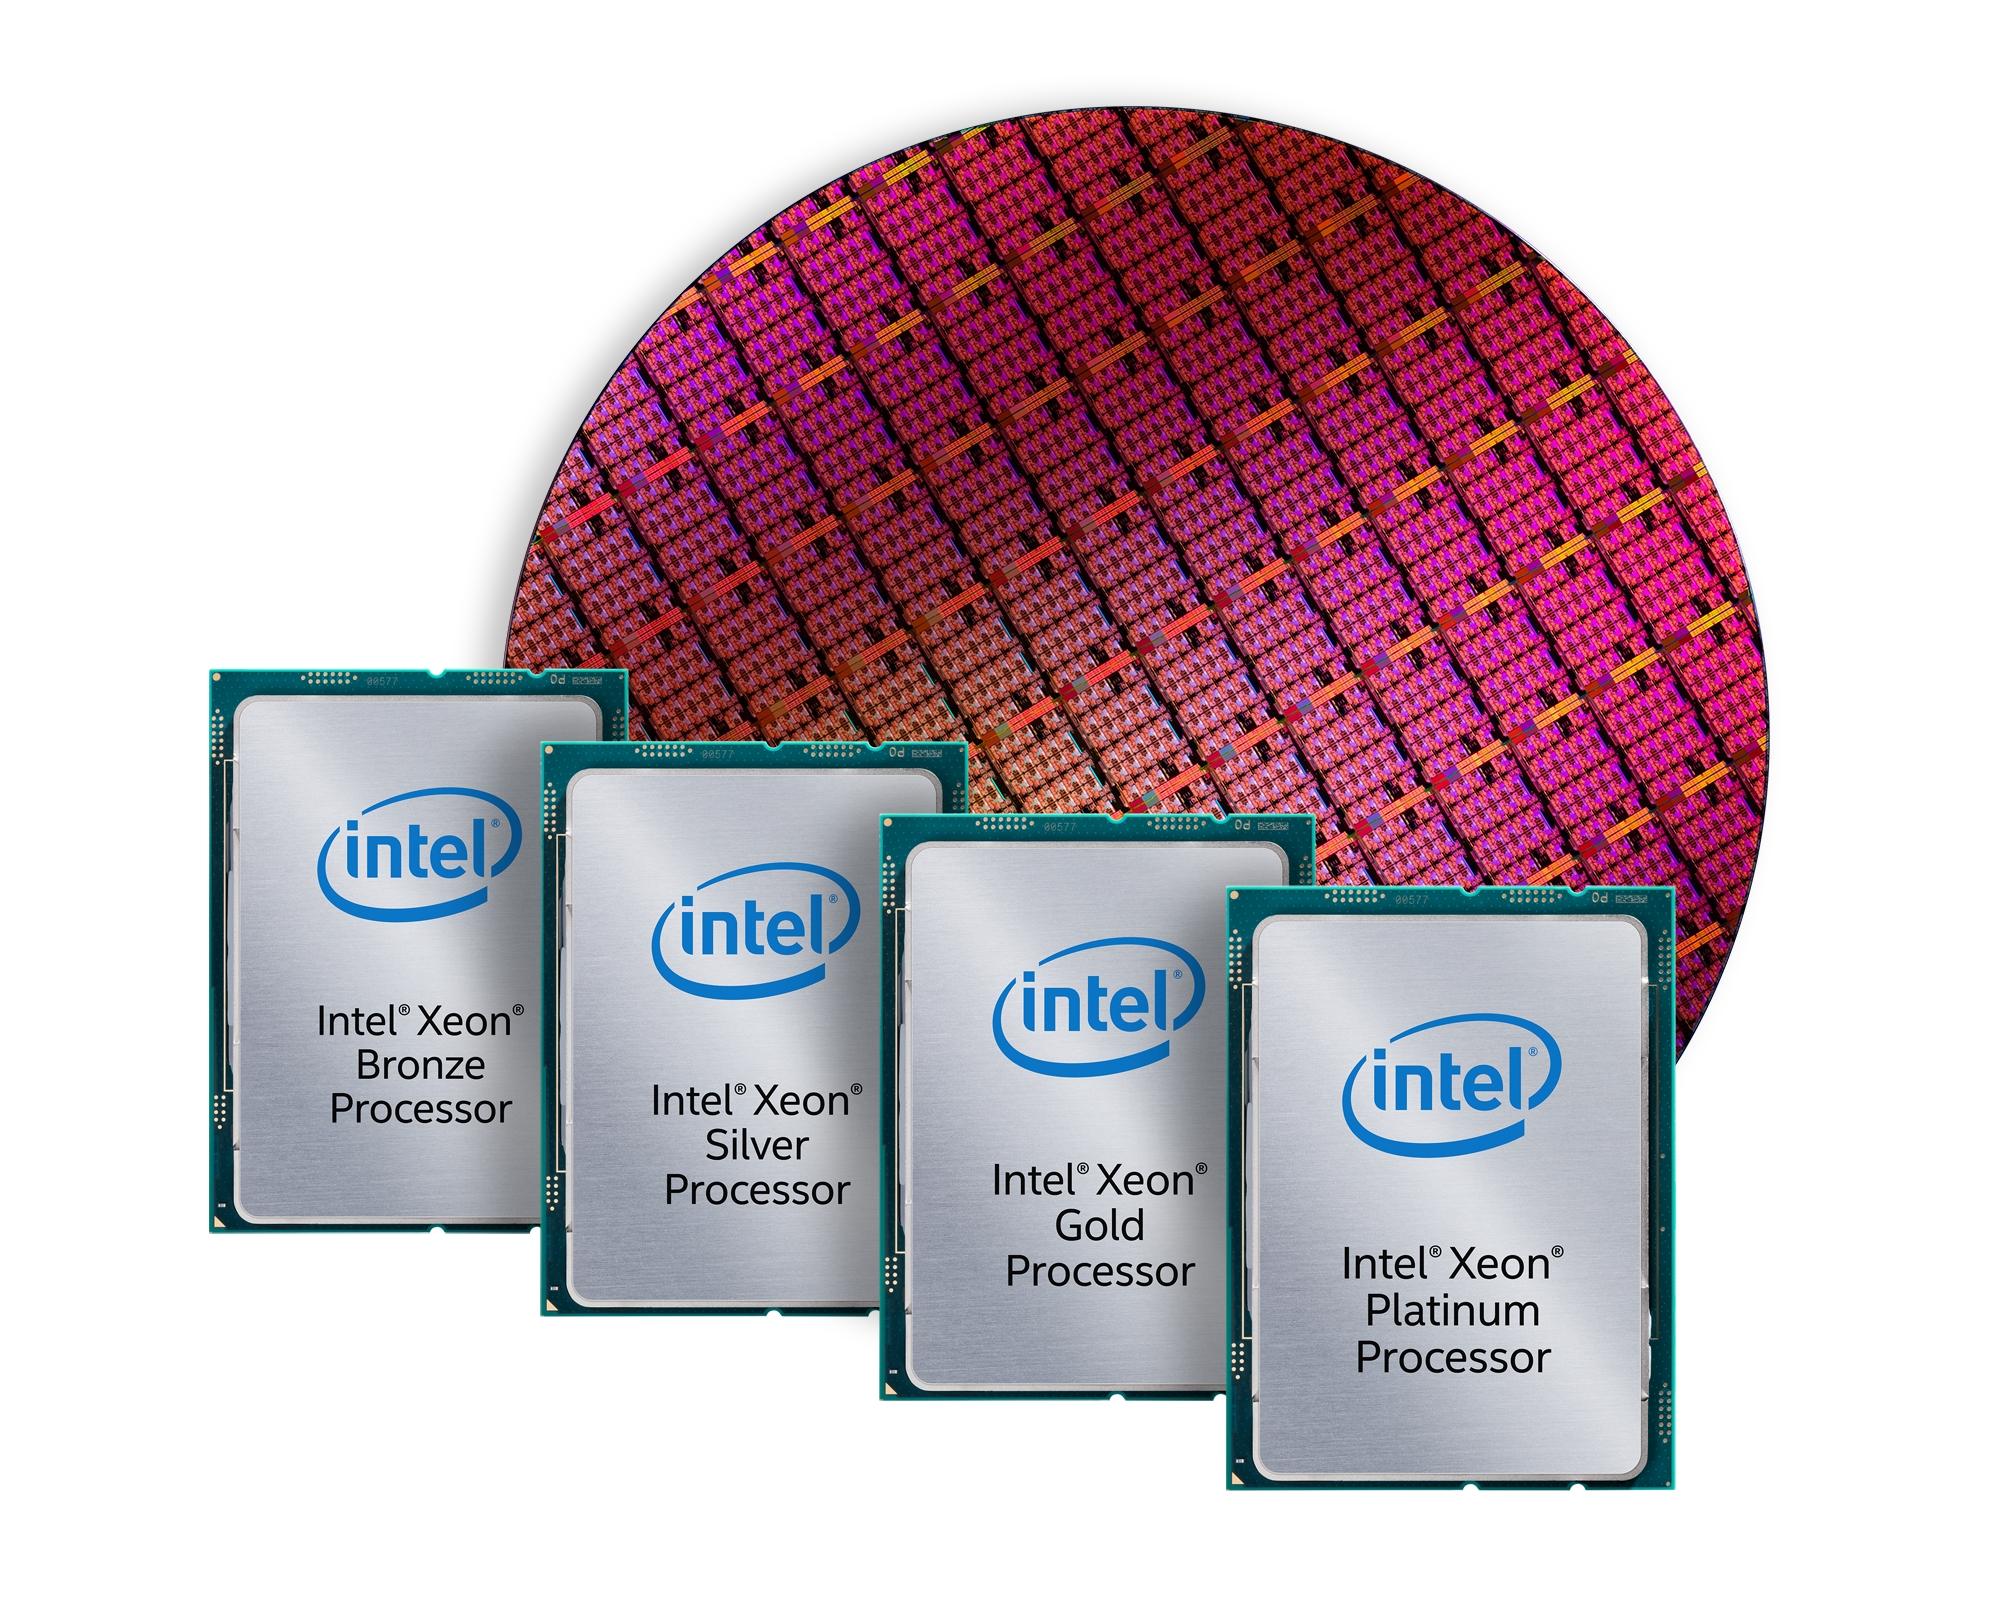 Imagen: Intel Corporation